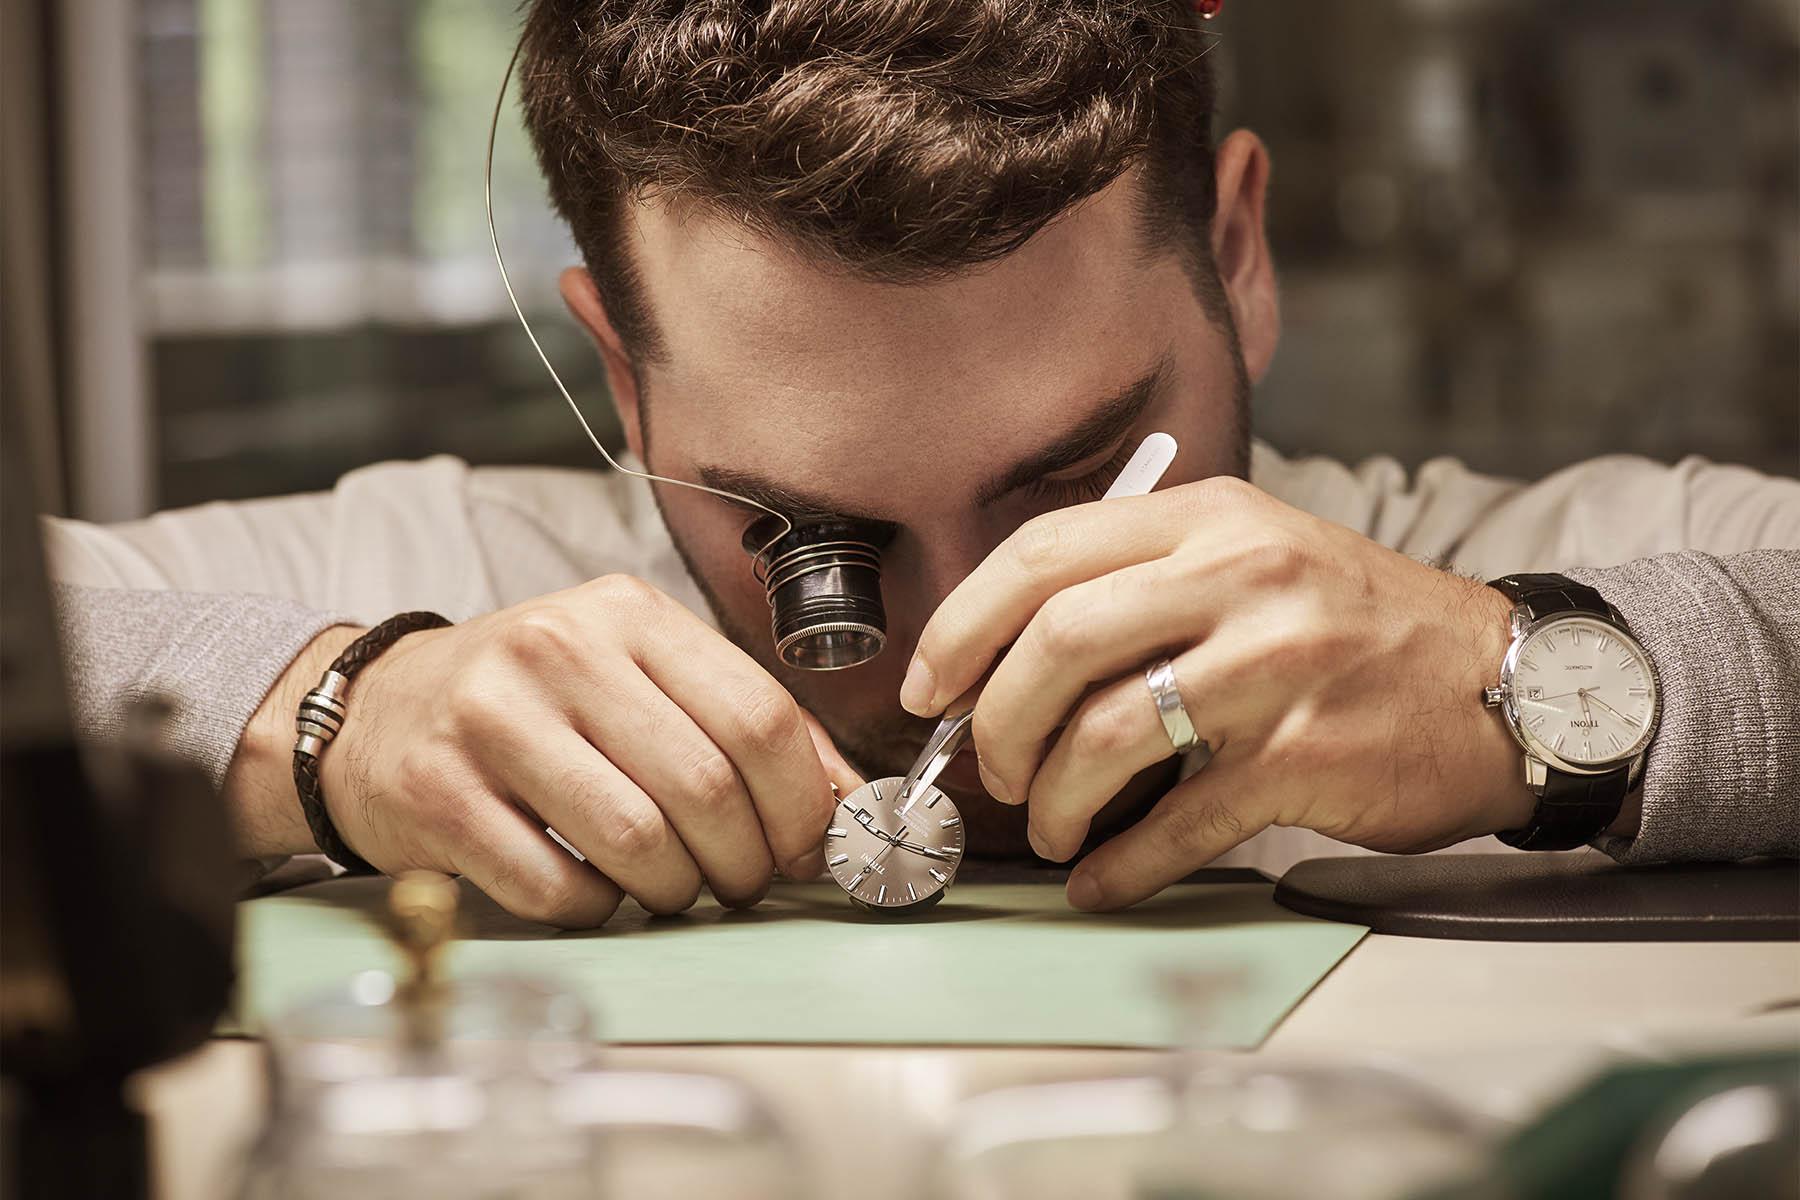 titoni watches manufacture